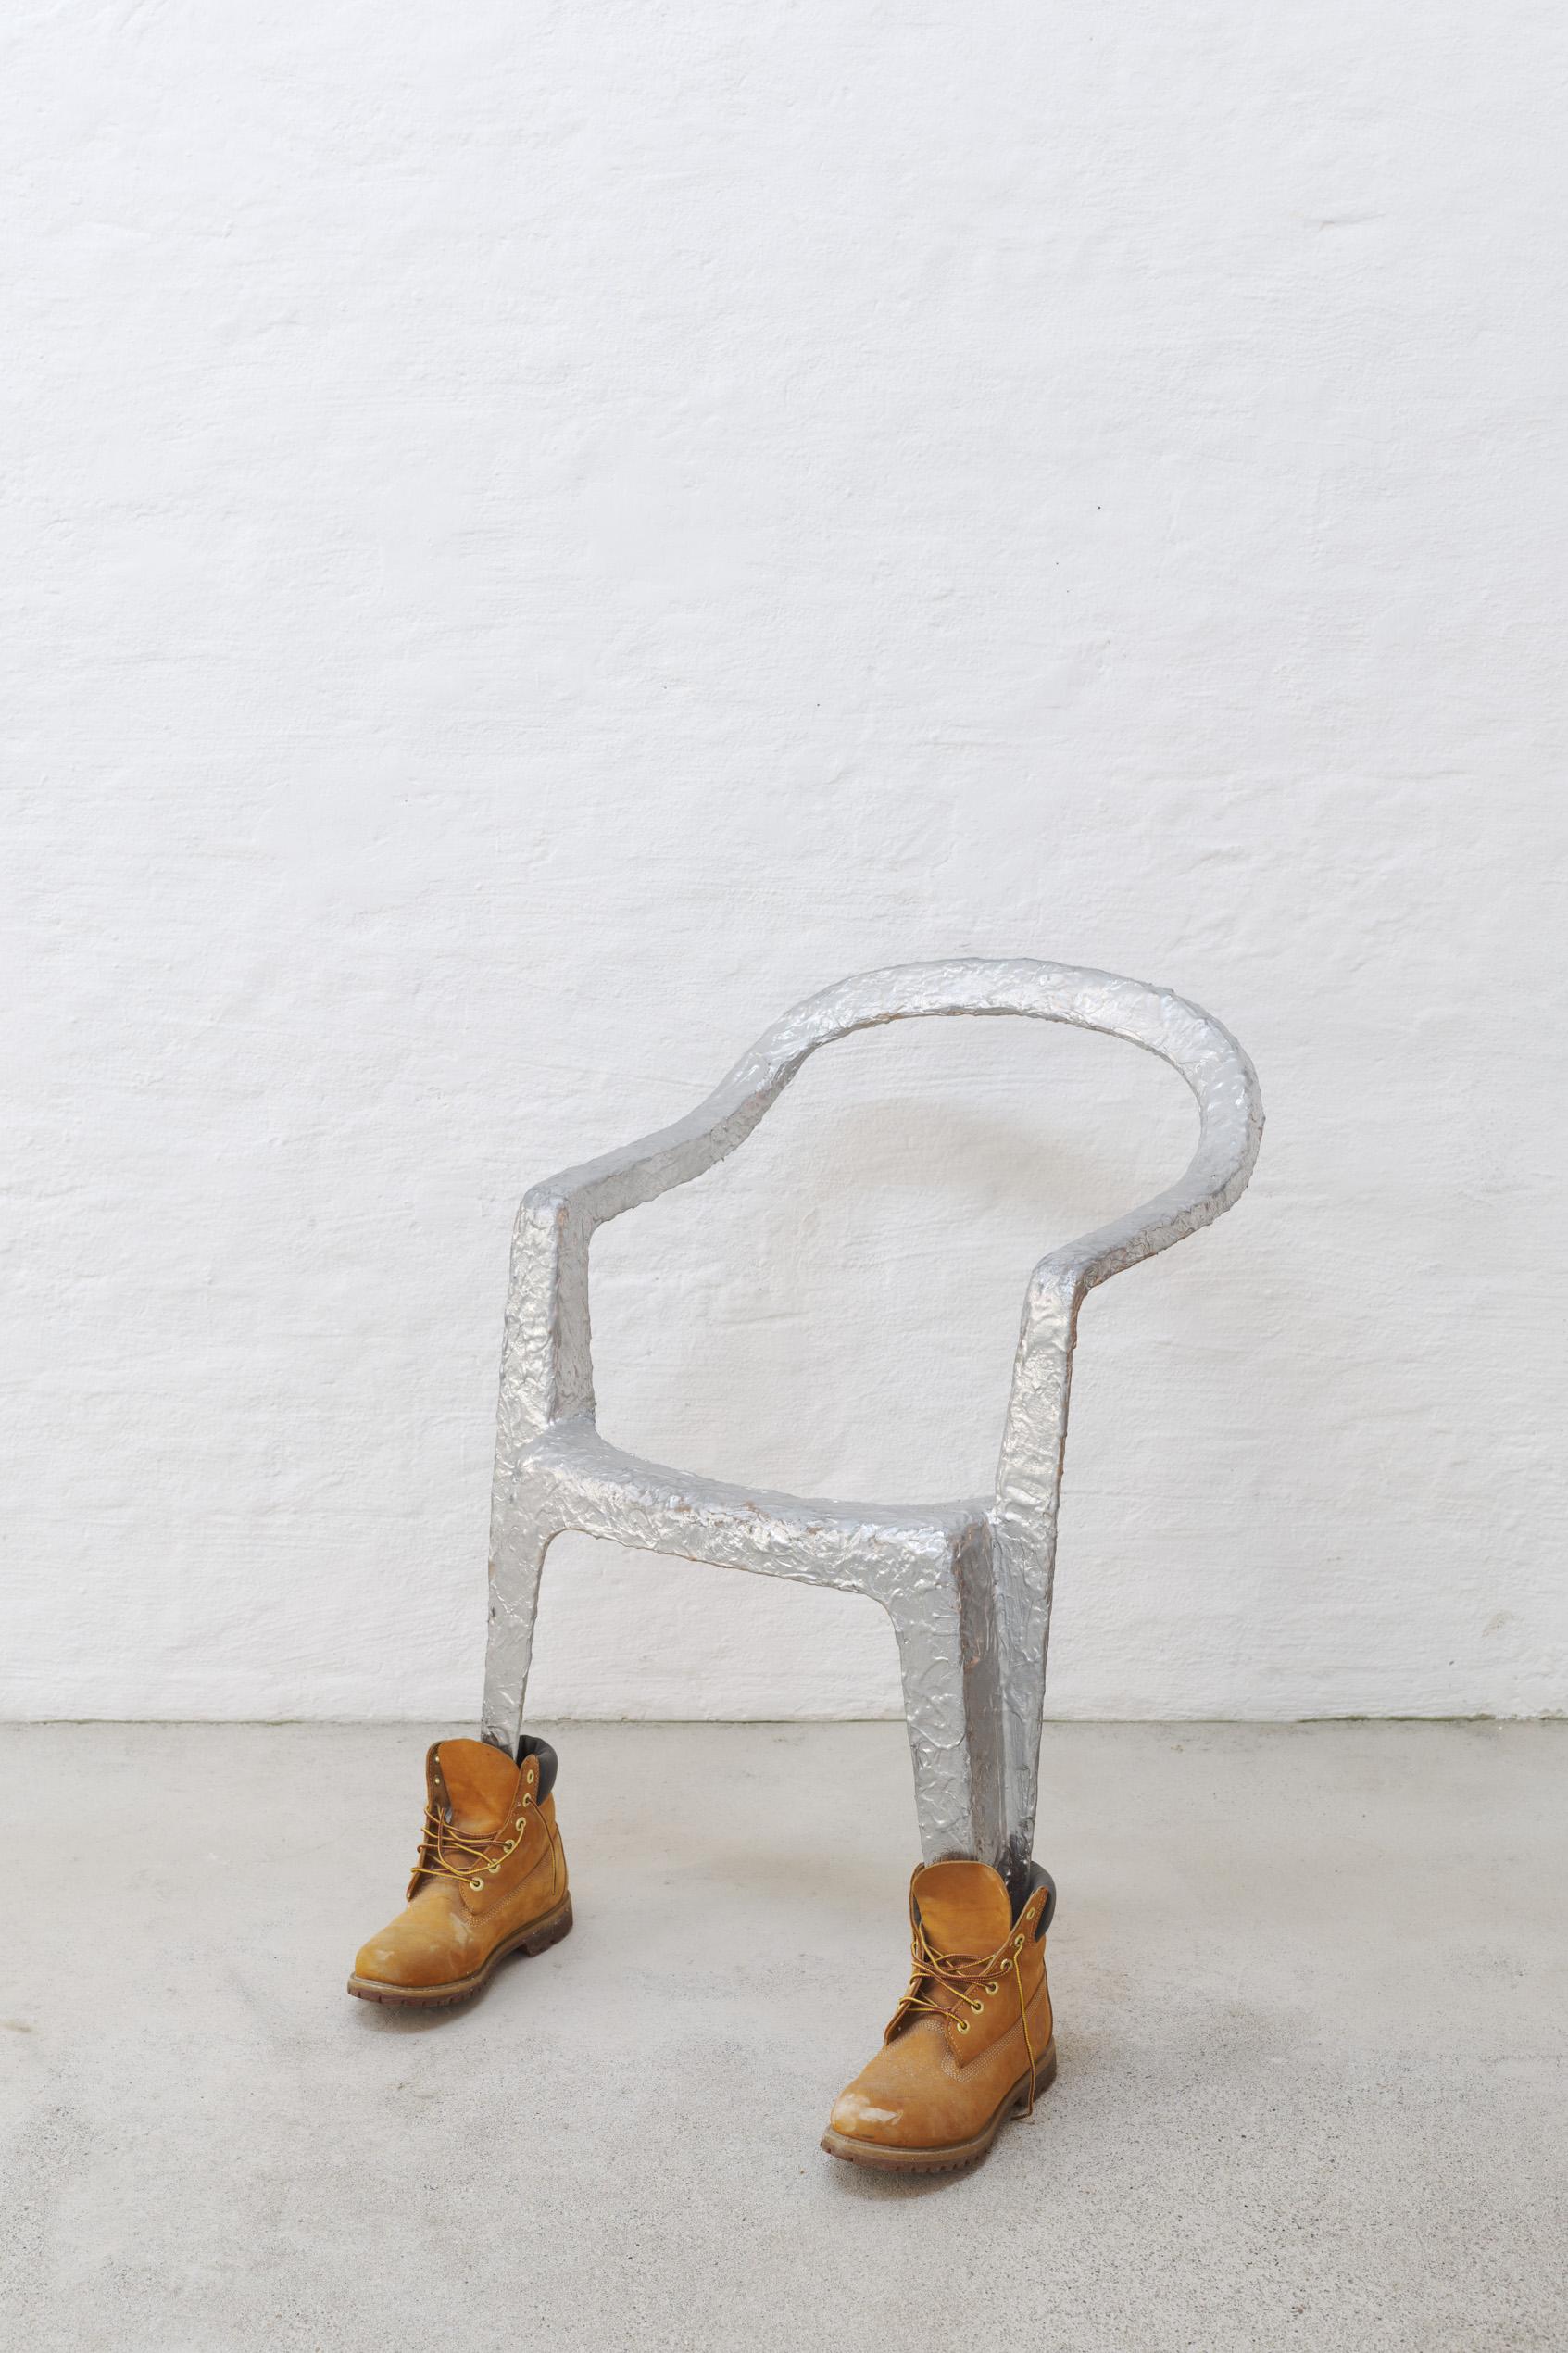 Lindsay Lawson, Jan Jansen, 2018, garden chair, Timberlands, latex, acrylic